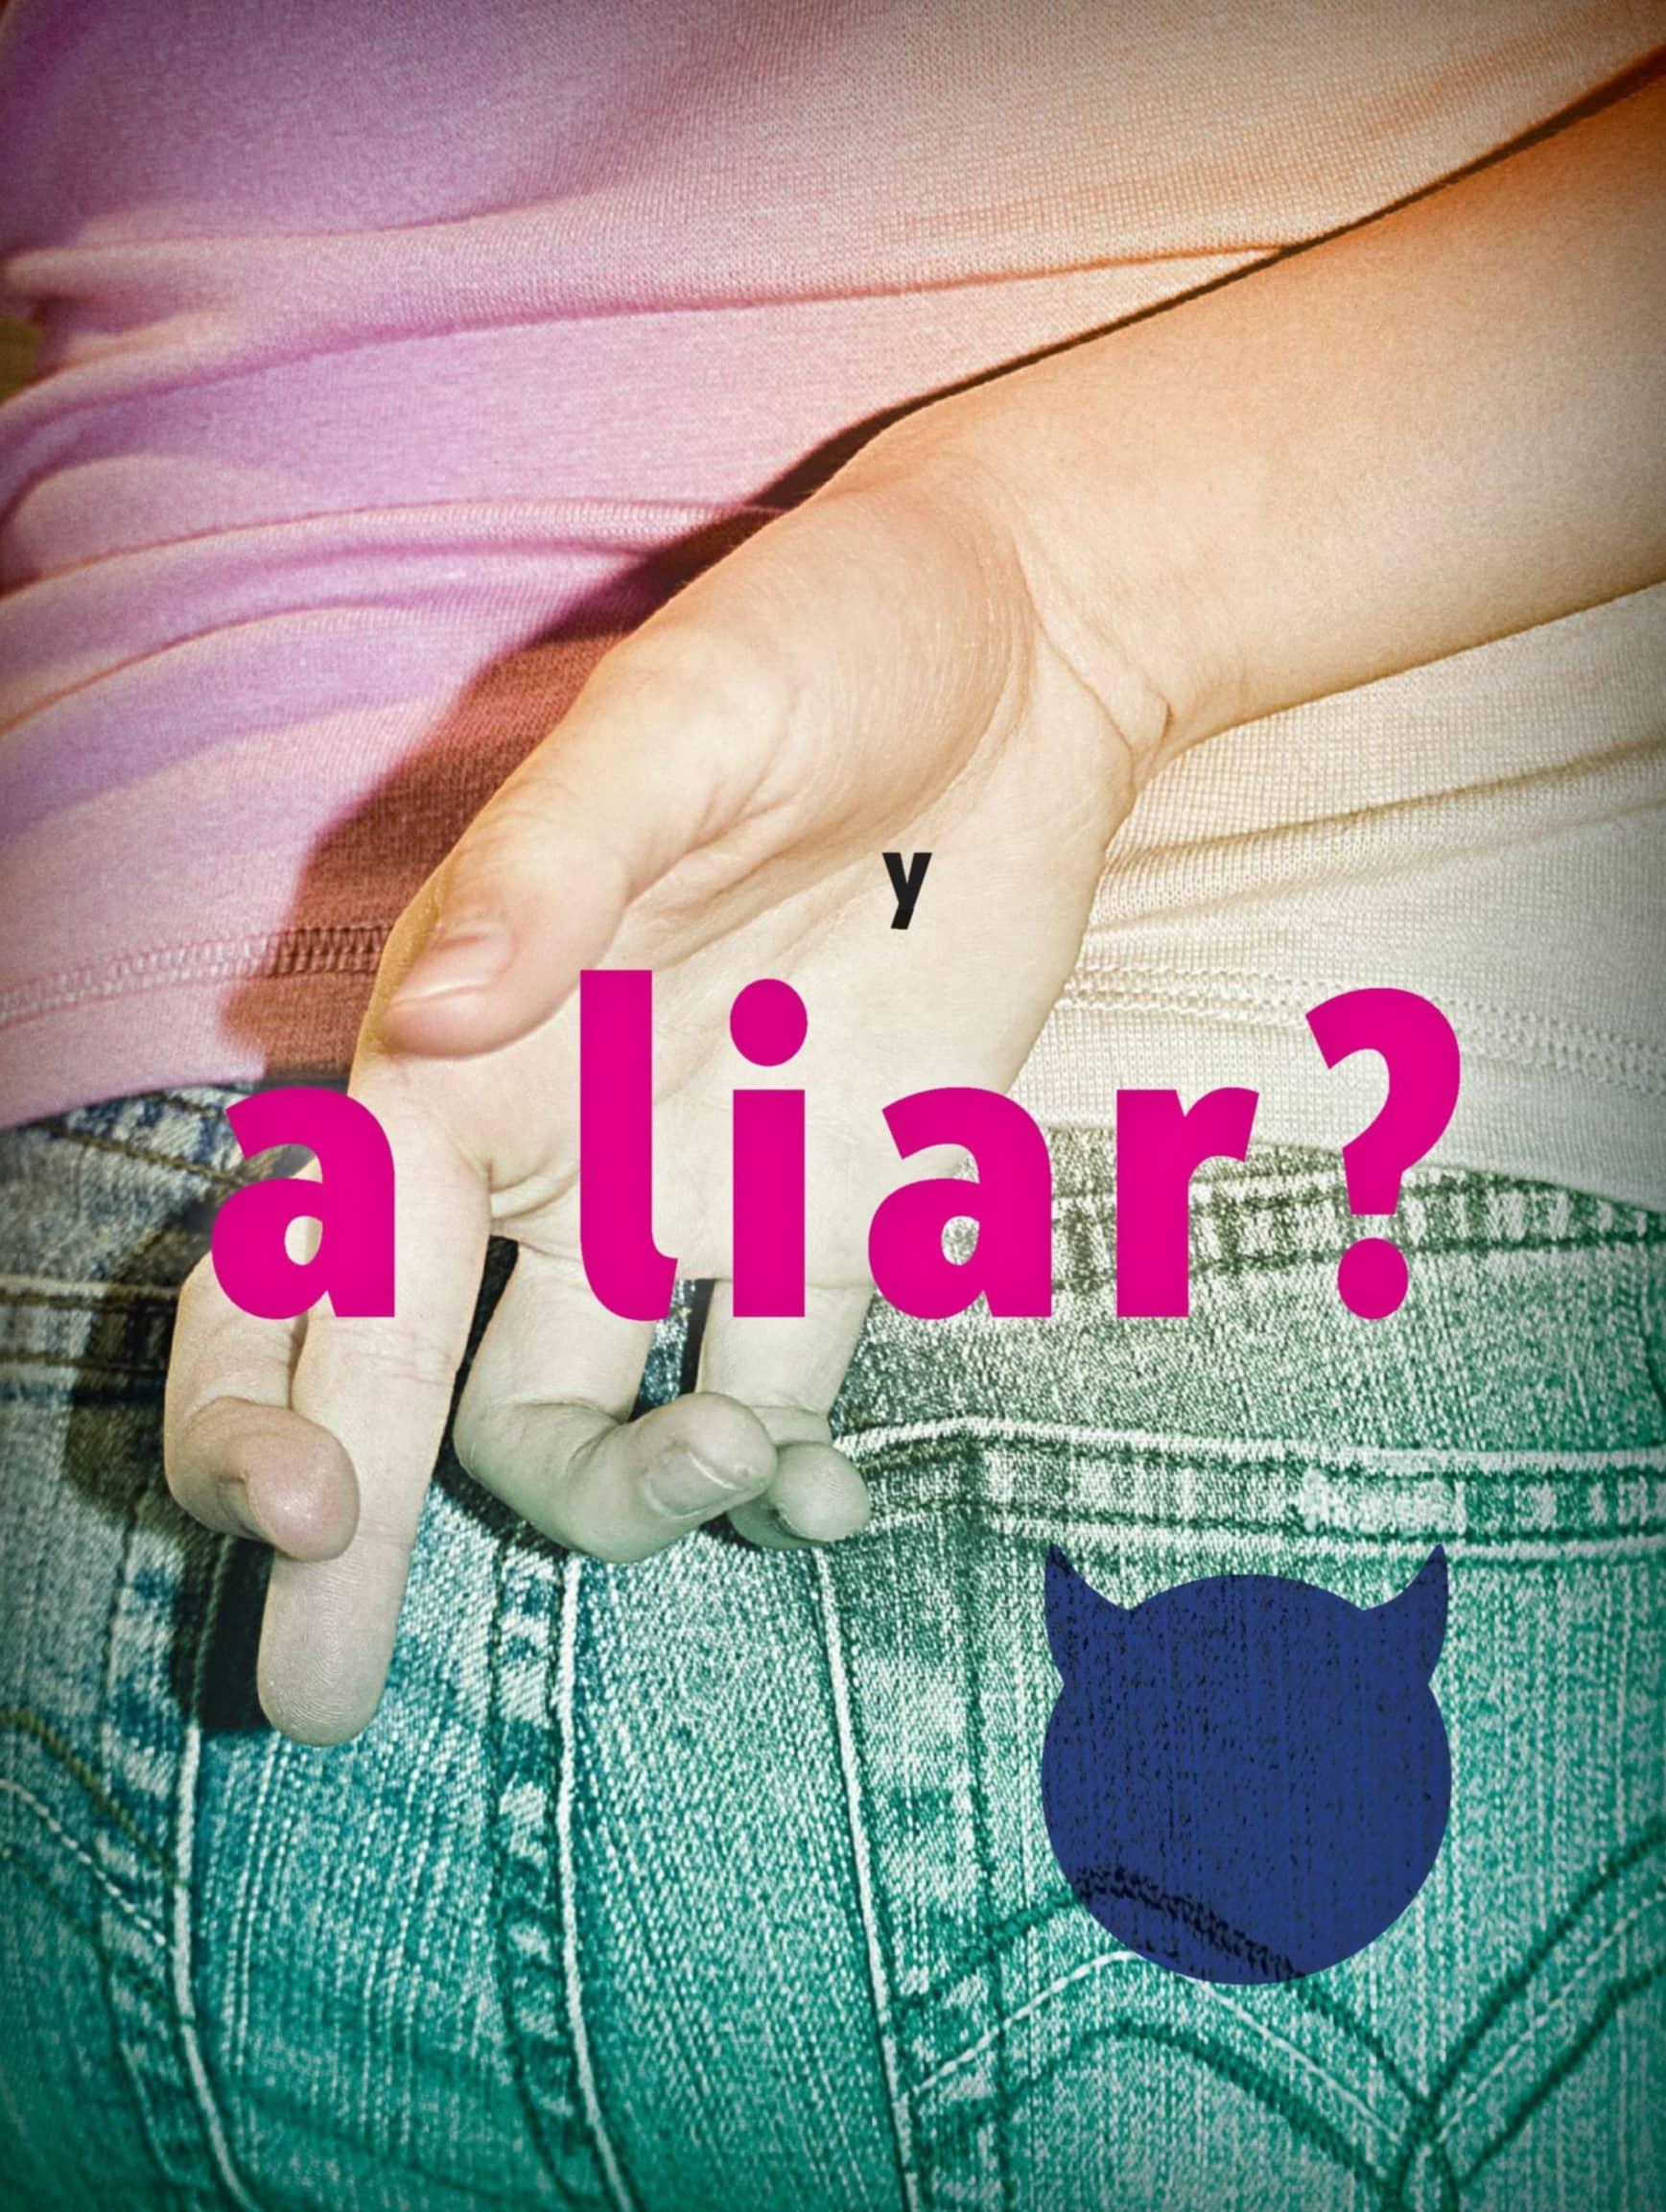 Is *everyone* a liar?